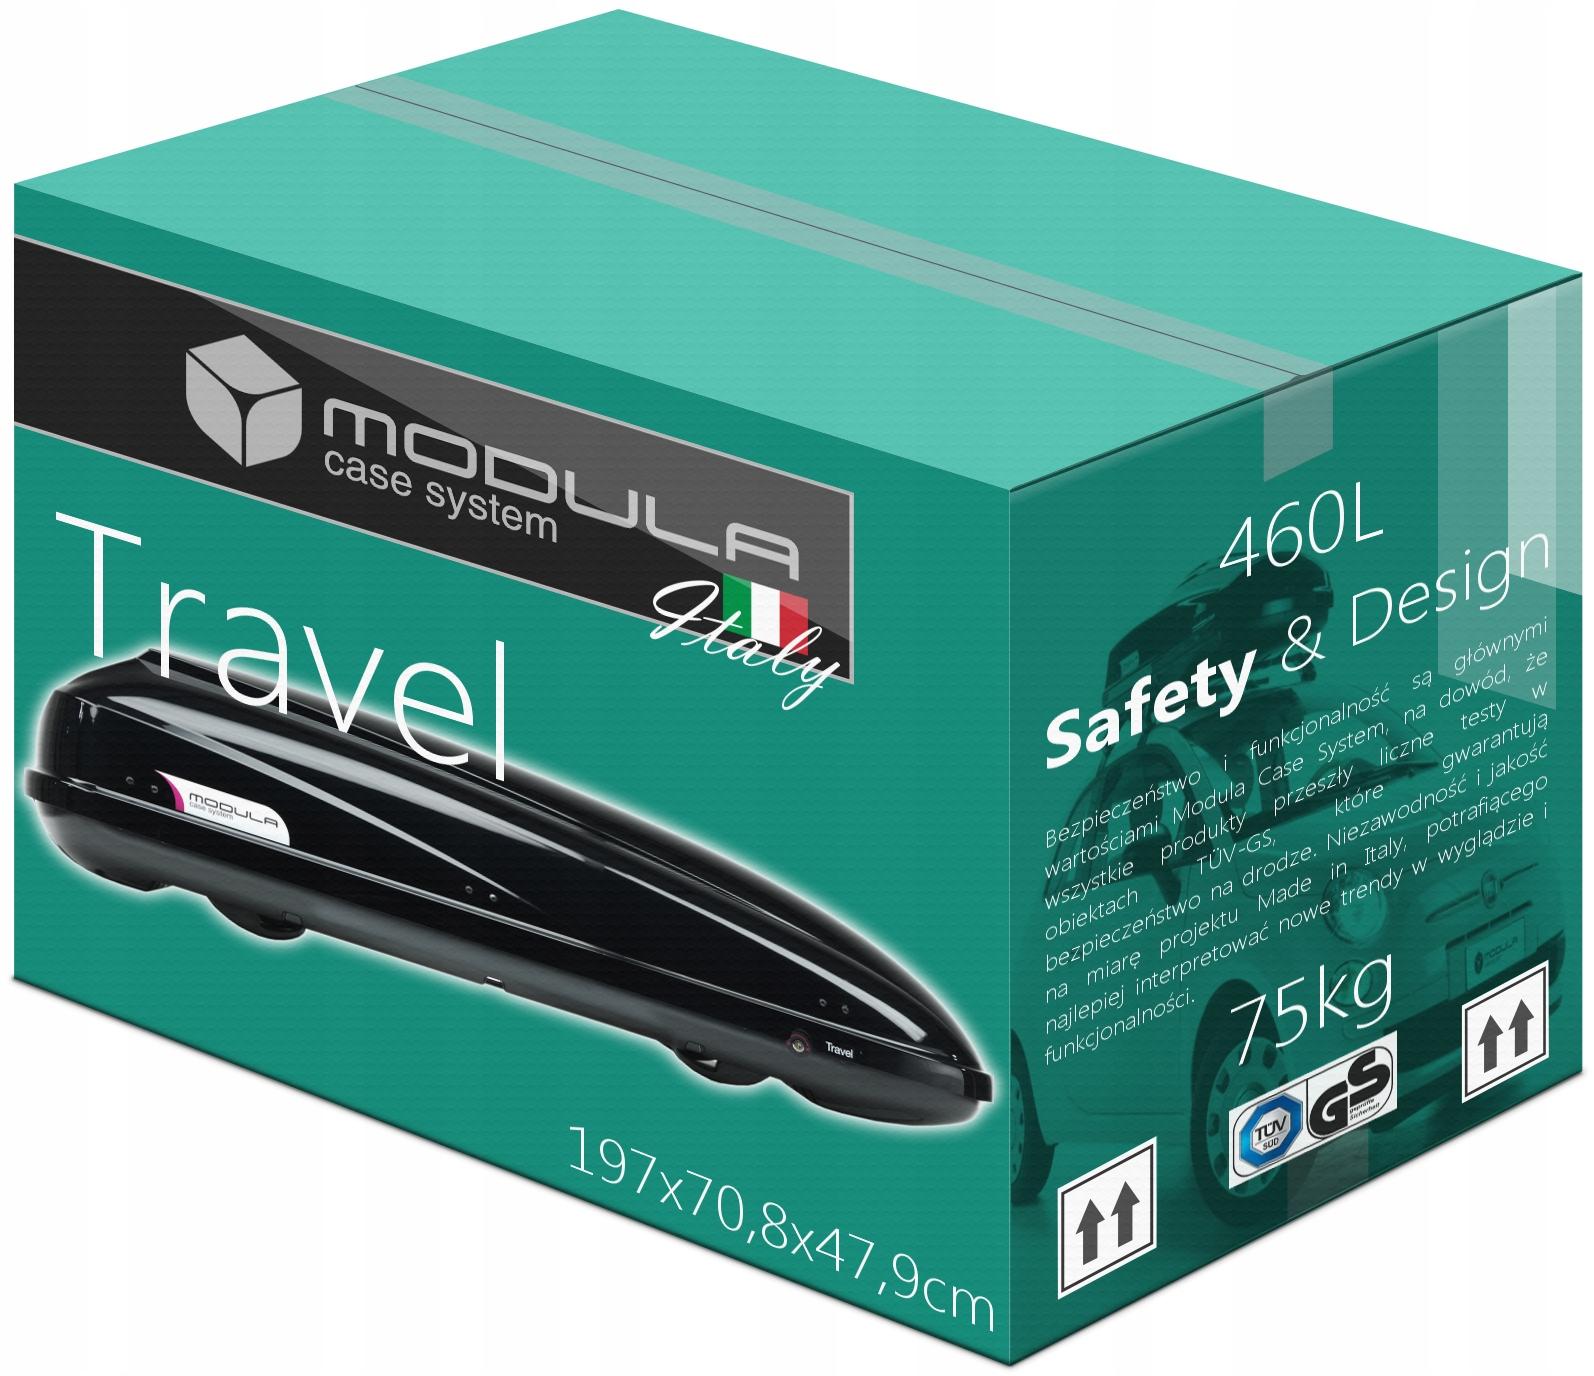 Крыша BOX BOX MODULA Travel 460L 197x70x48